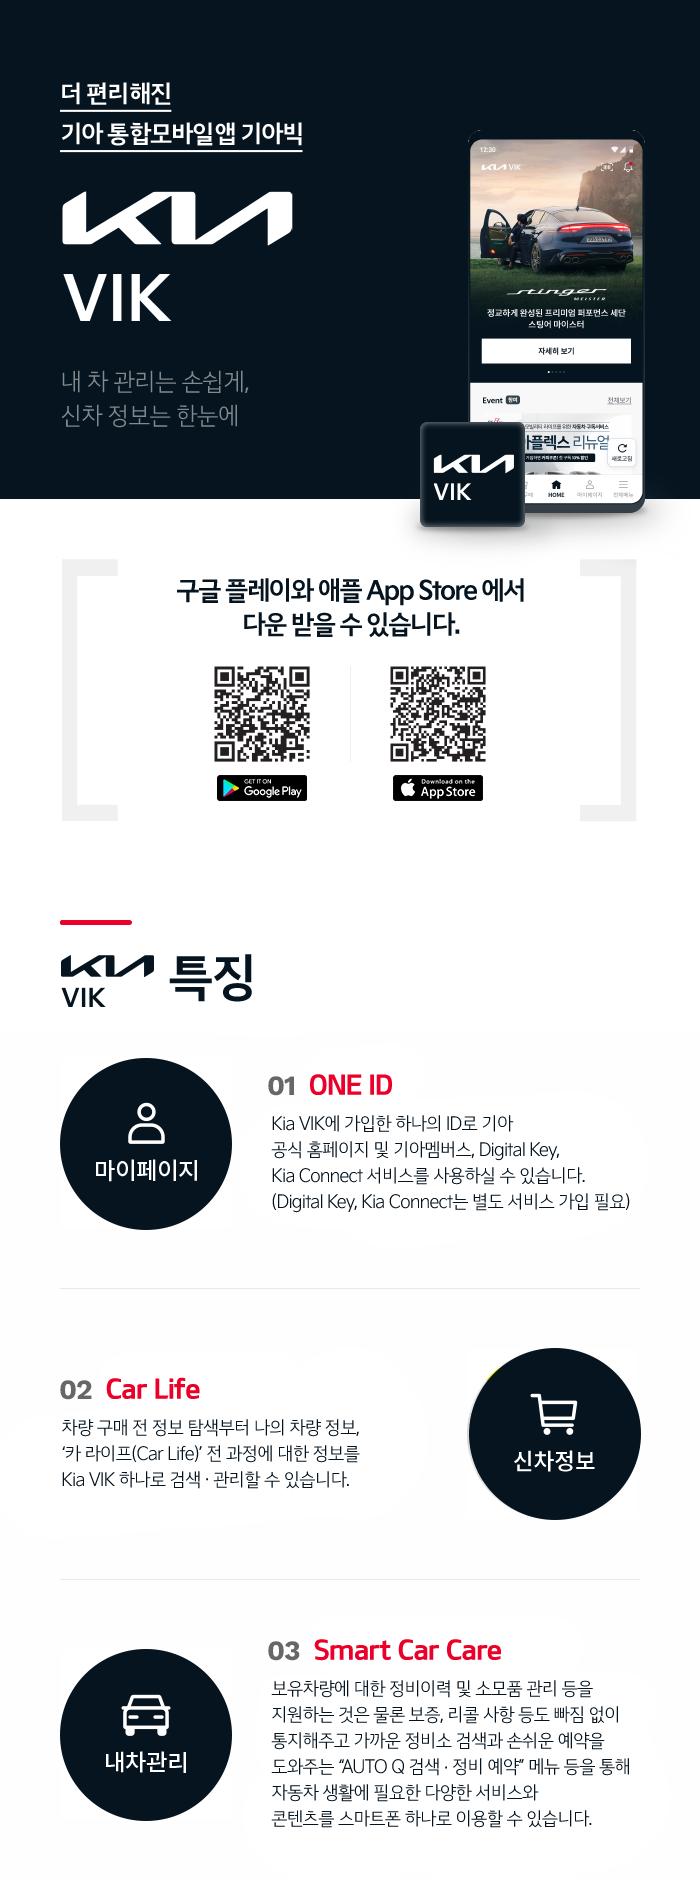 Kia VIK 앱 소개 이미지